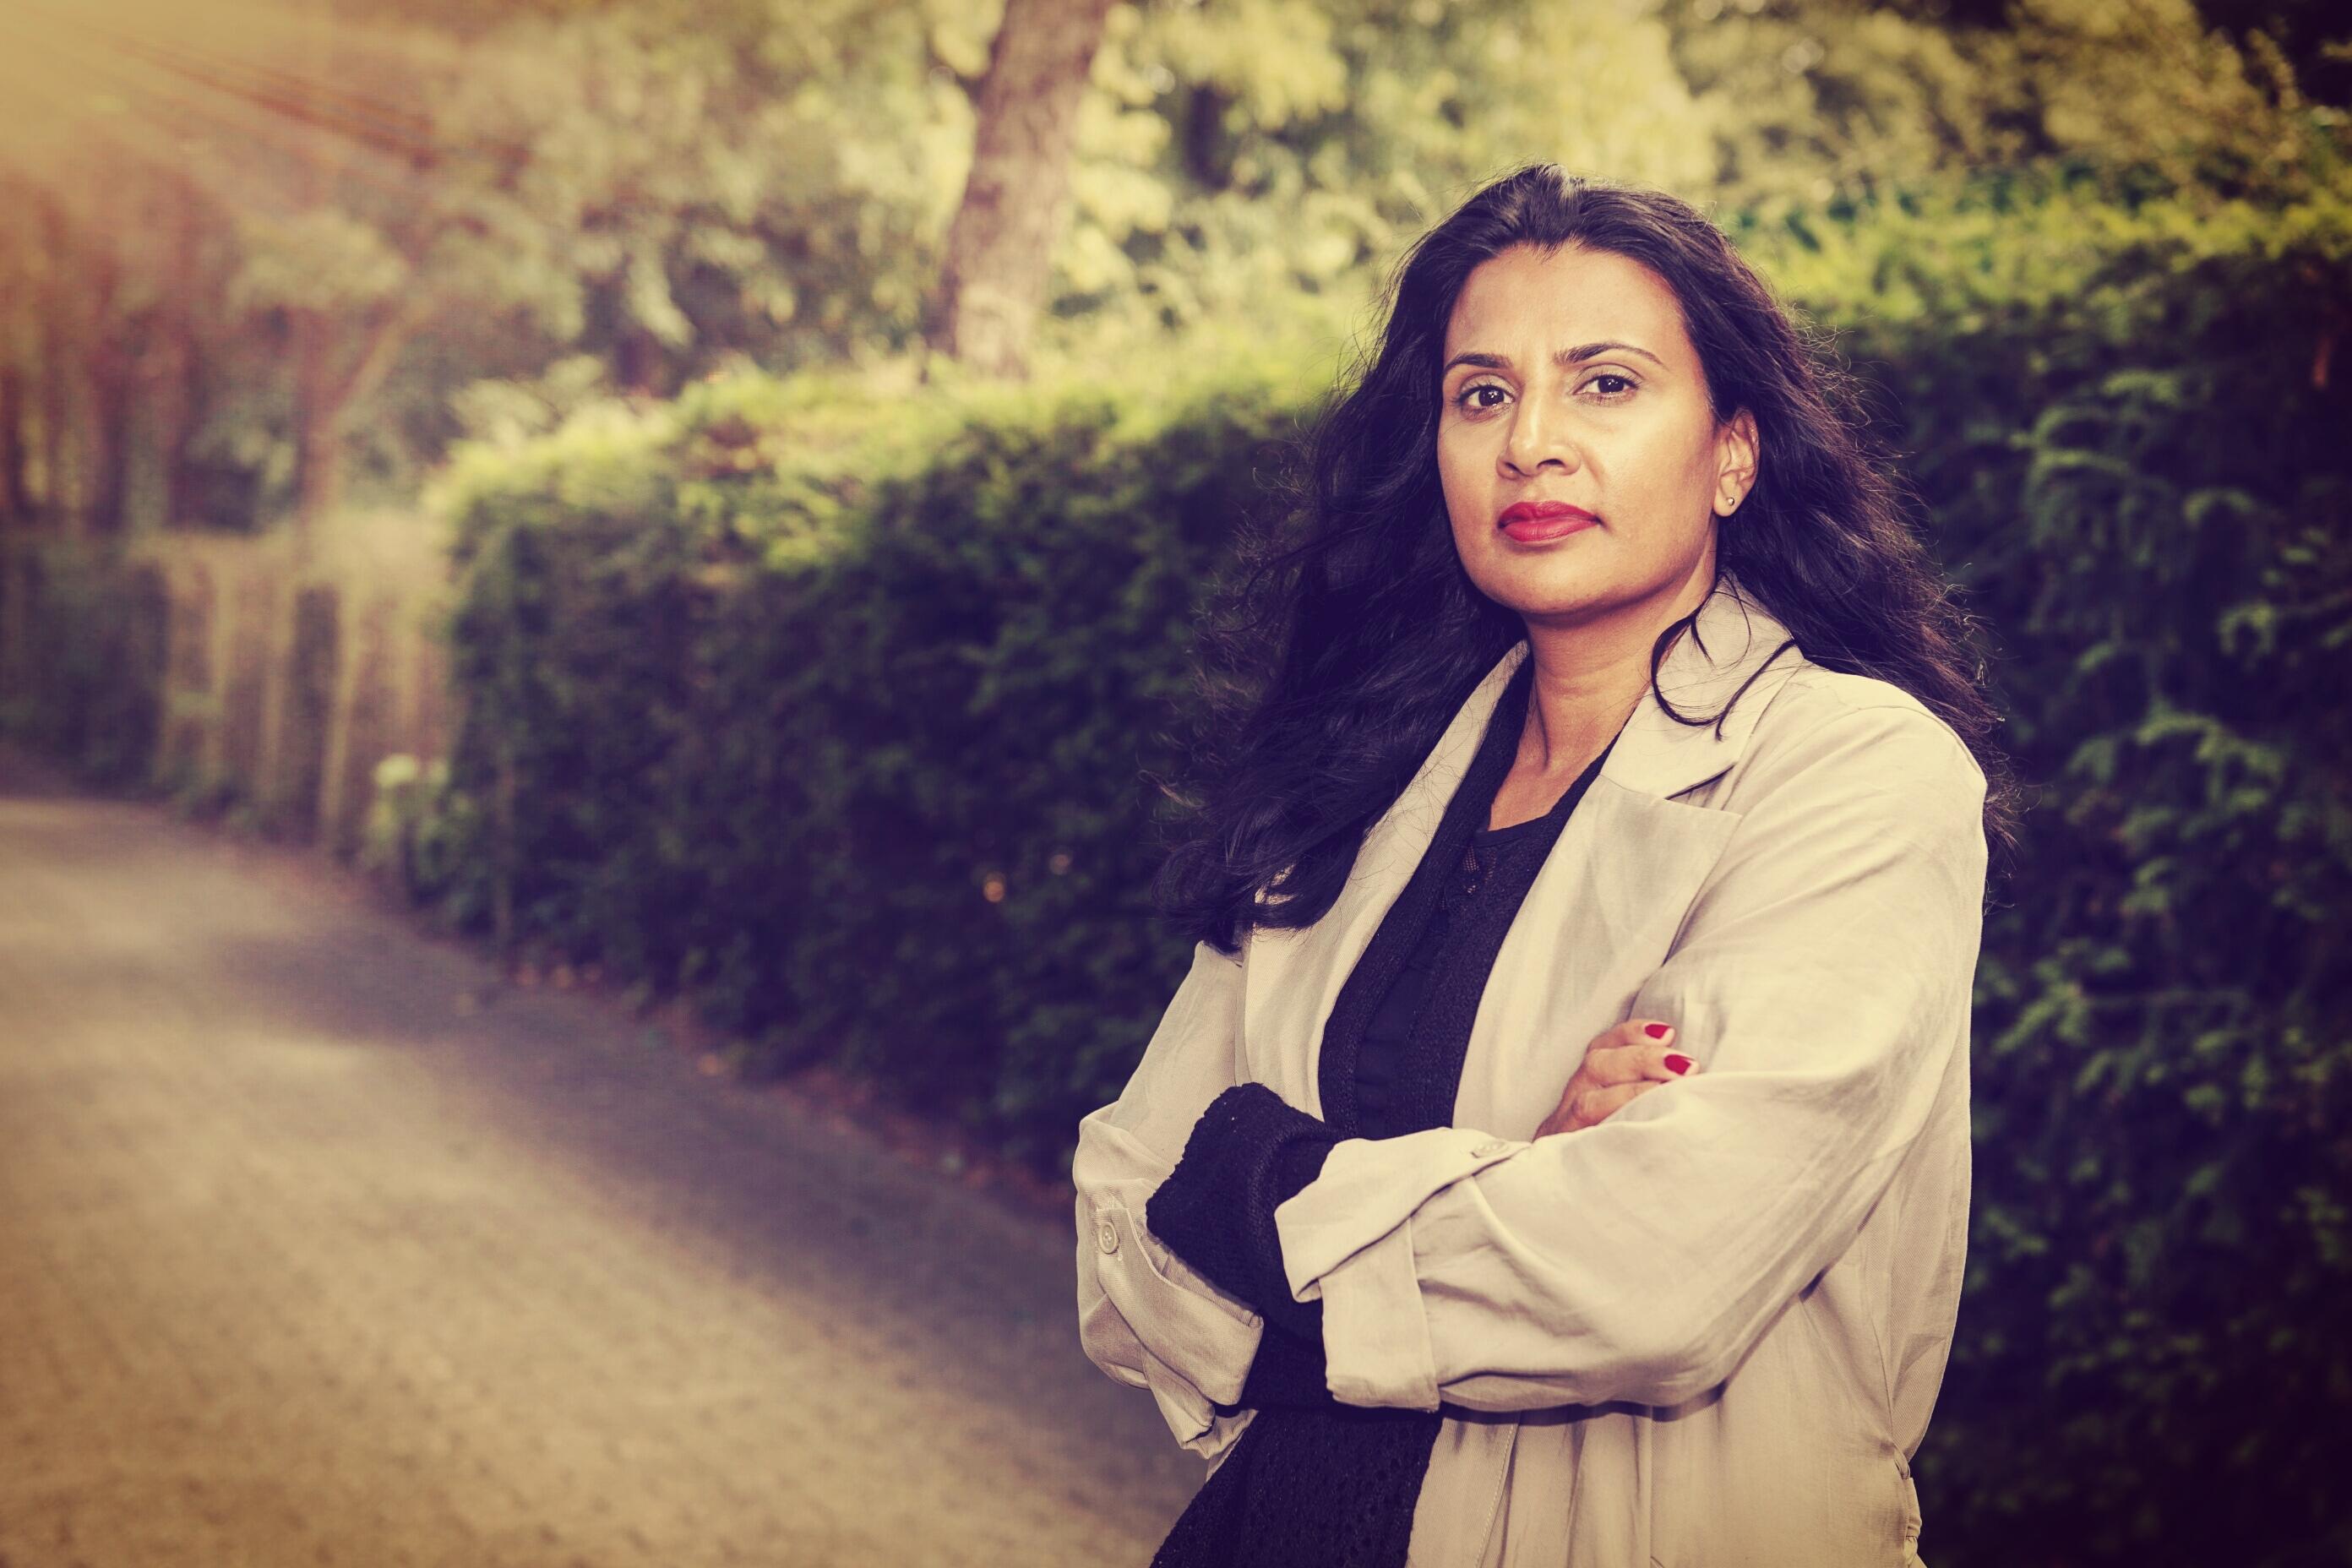 dr.mr. Sheila Adjiembaks | criminoloog / onderzoeker dr.mr. Sheila Adjiembaks | criminoloog / onderzoeker dr.mr. Sheila Adjiembaks | criminoloog / onderzoeker | ESSA Research